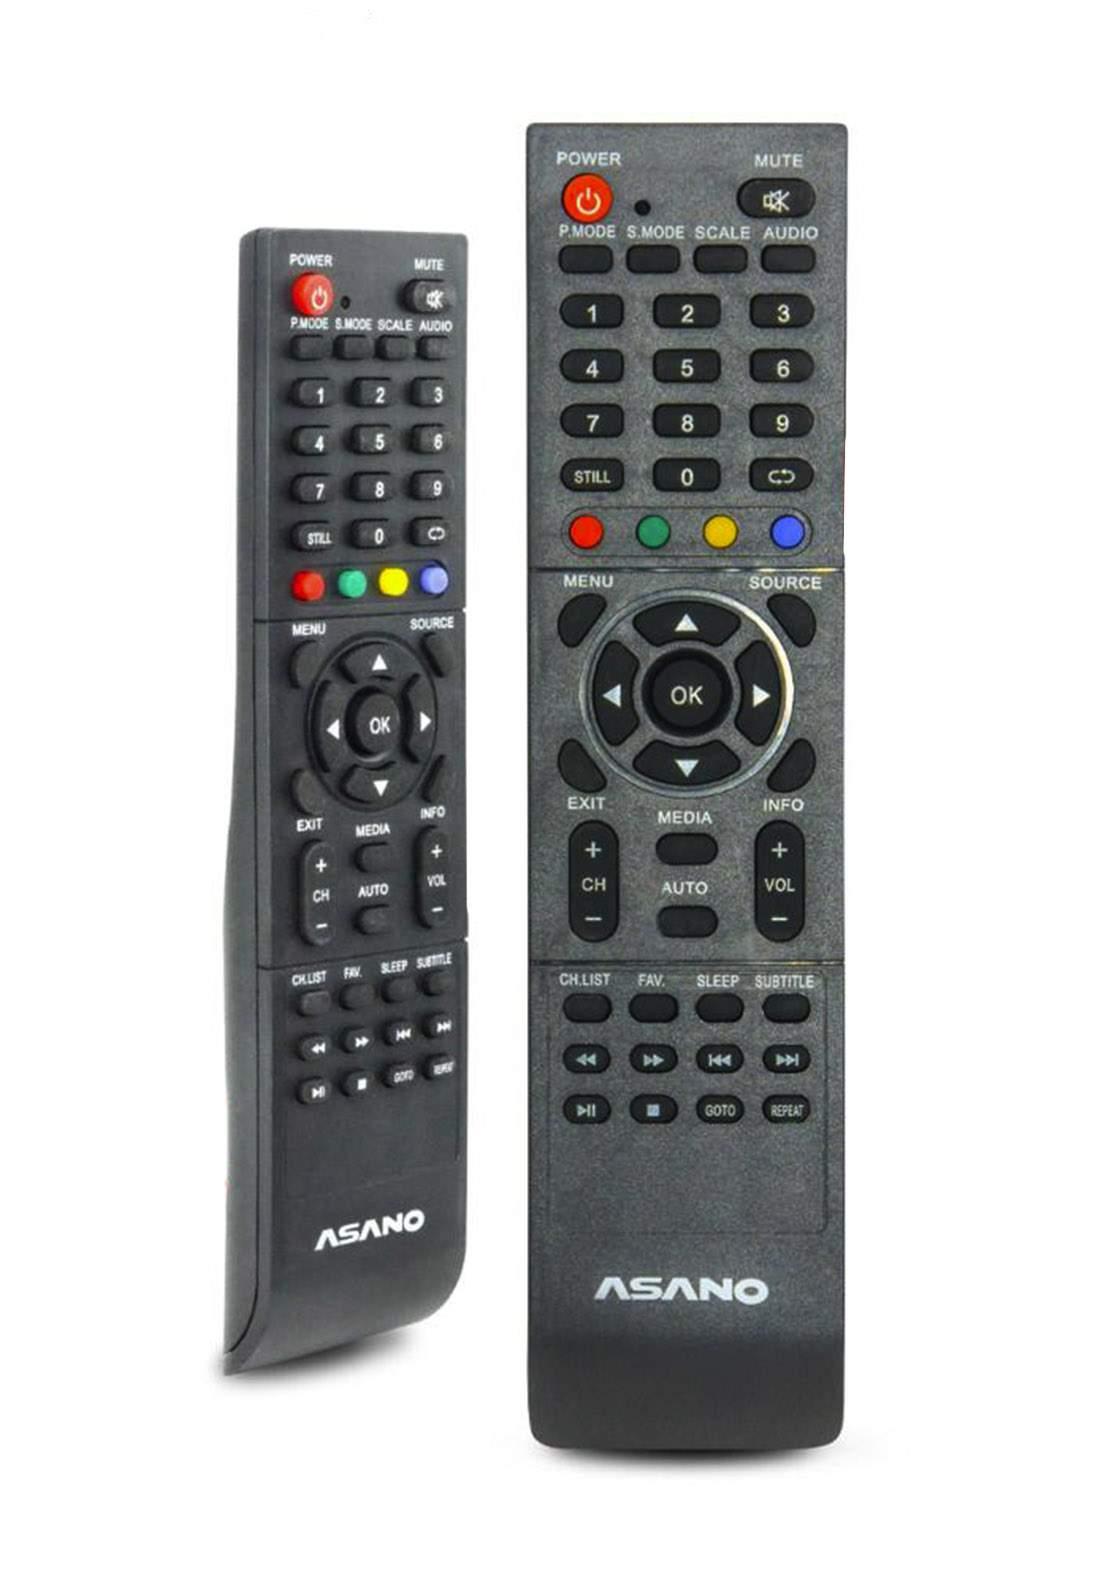 Remote Control For Asano Plasma TV (A-651) جهاز تحكم عن بعد